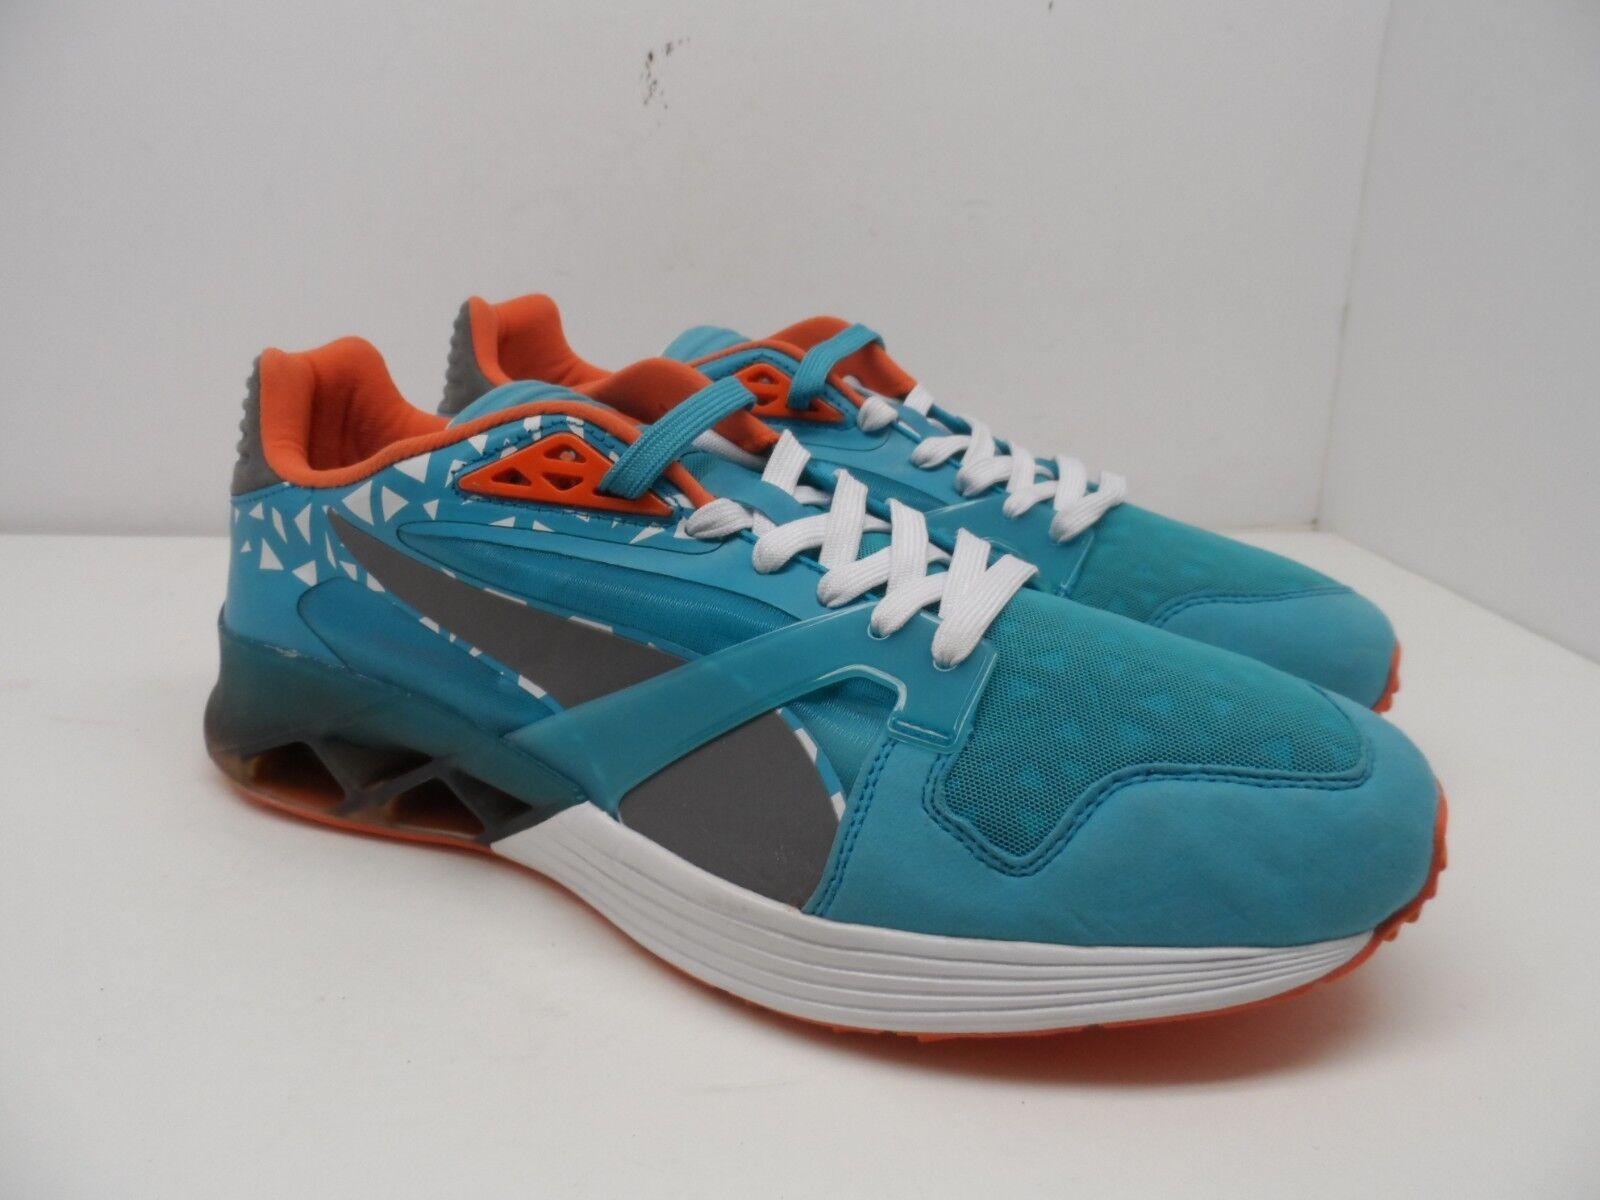 PUMA Men's Future XT-Runner Translucent Sneaker Translucent Green Size 12M